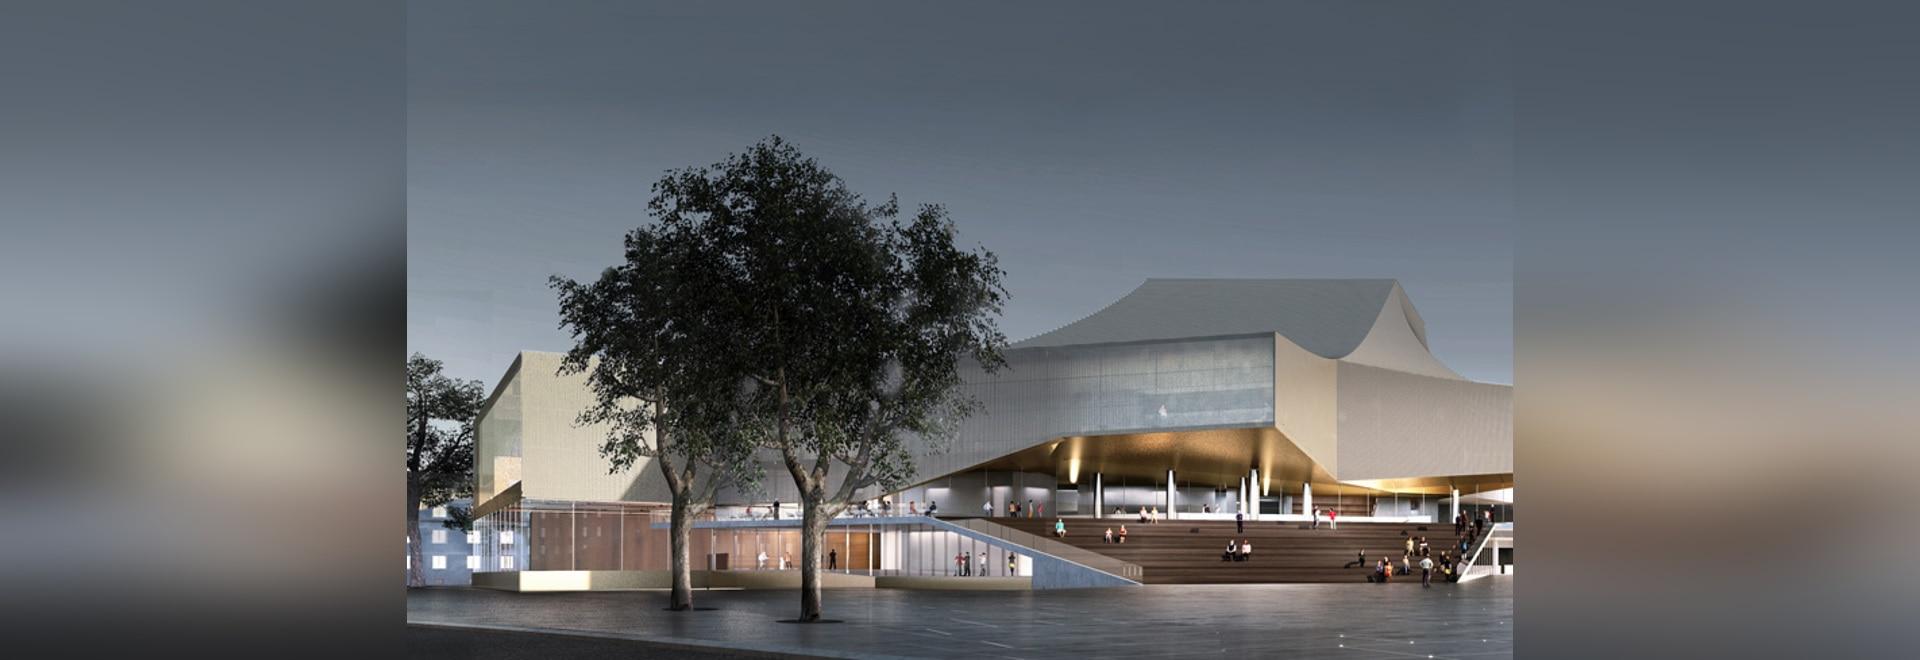 delugan meissl chosen to renovate karlsruhe's badisches staatstheater